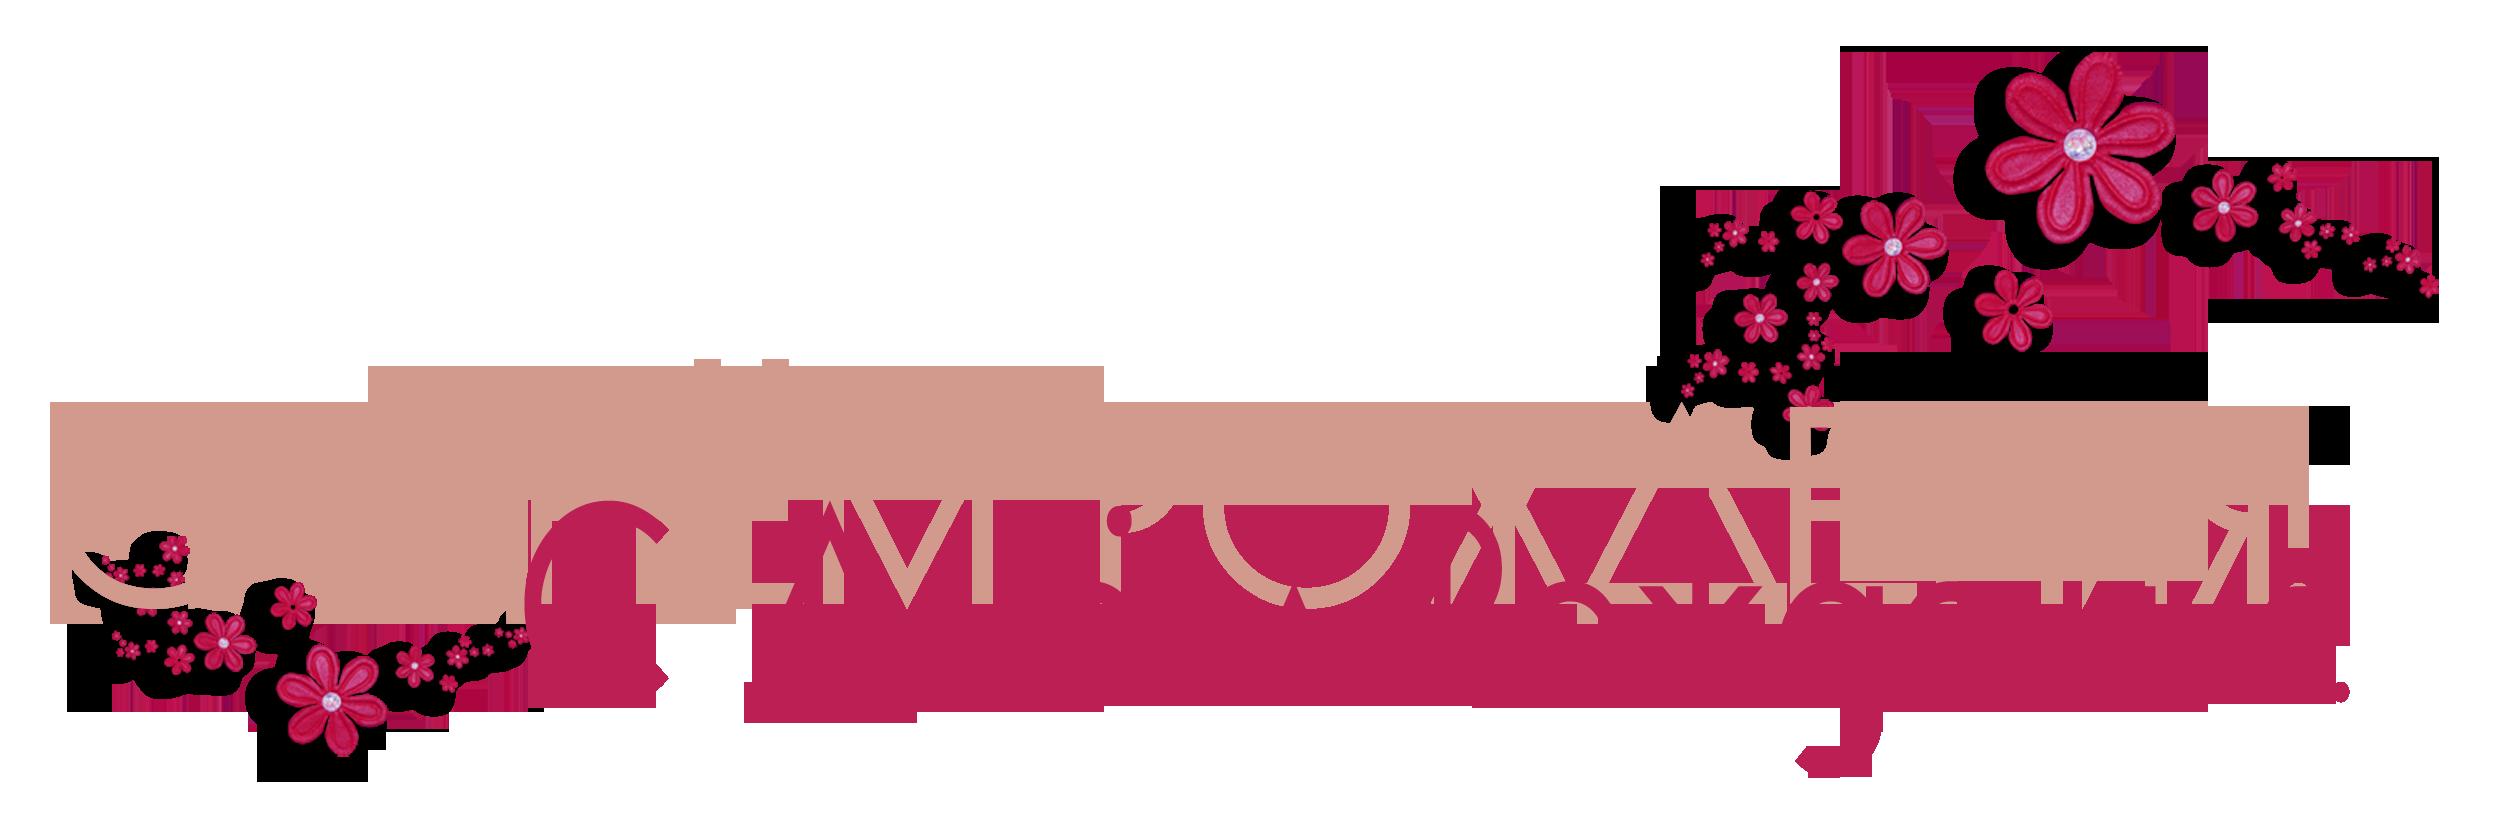 http://img-fotki.yandex.ru/get/6507/16969765.23/0_67022_7f50e18b_orig.png